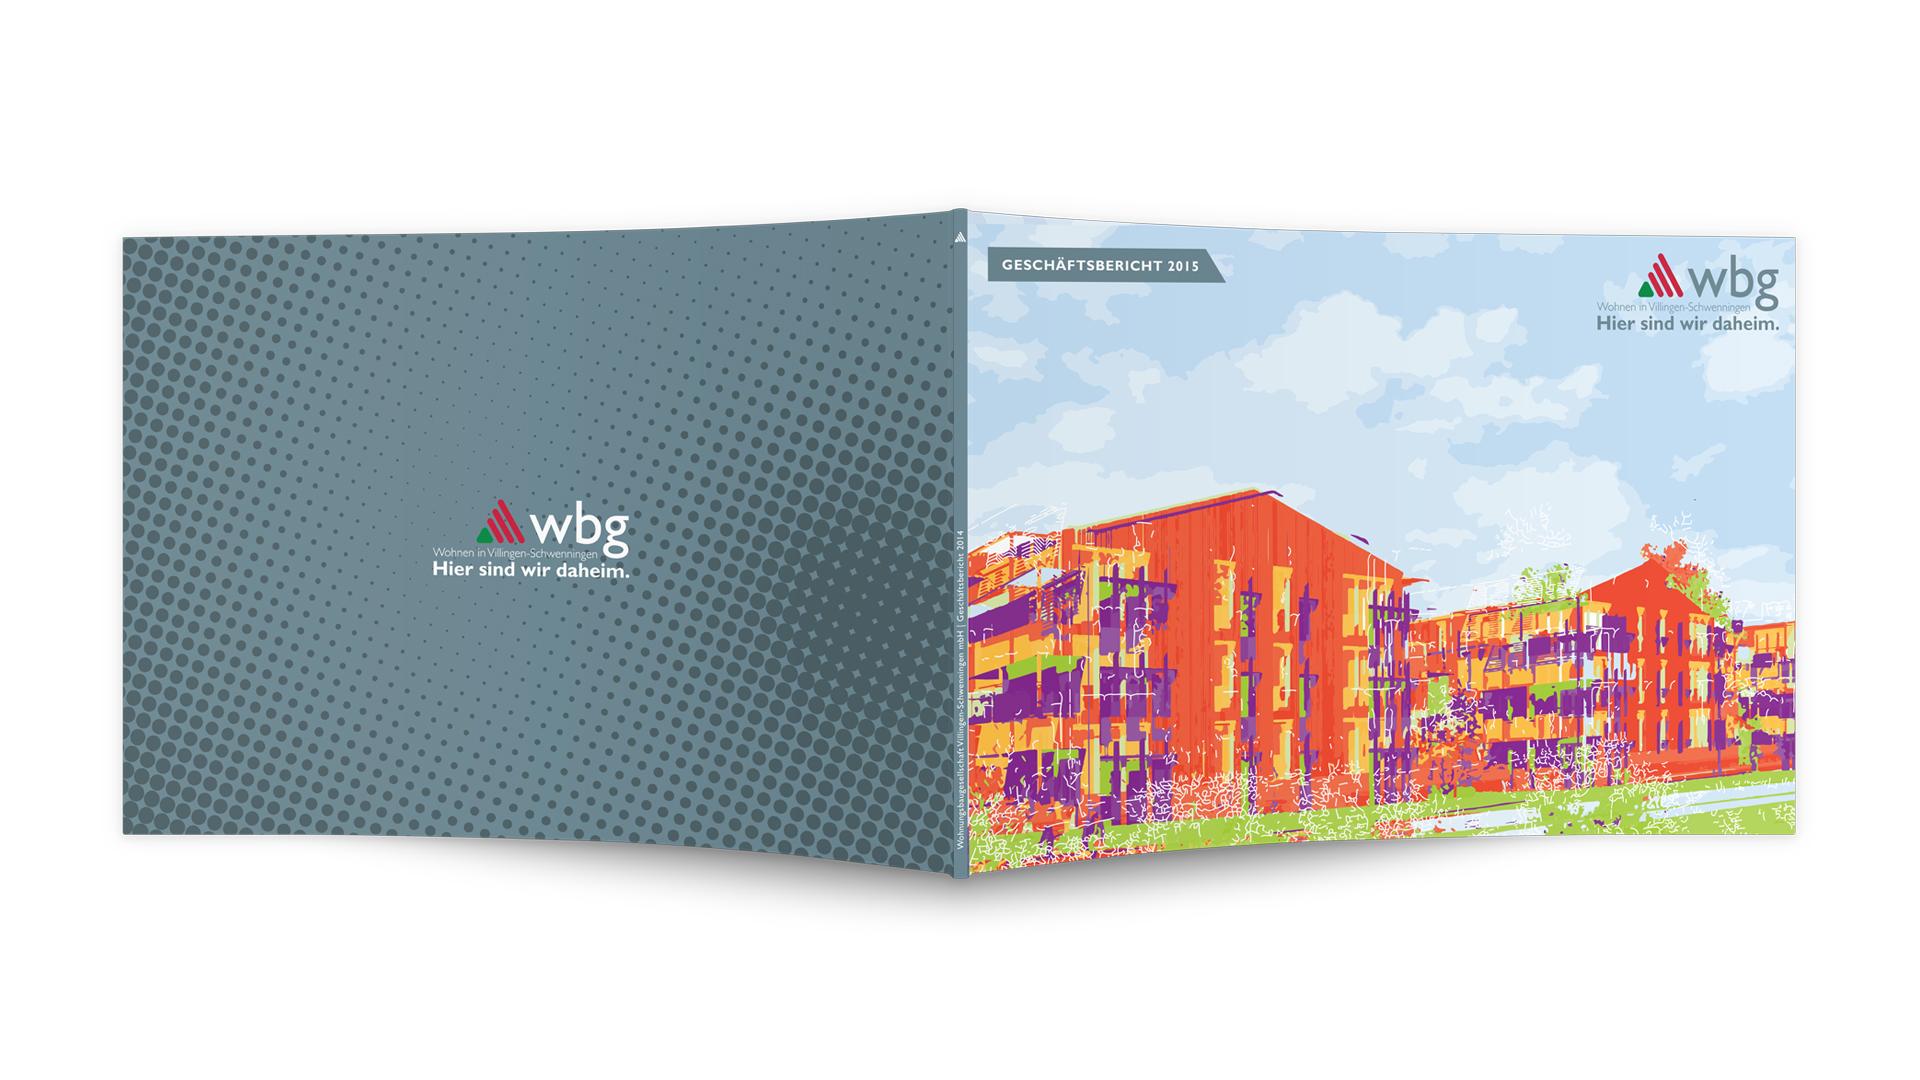 wbg Geschäftsbericht 2015